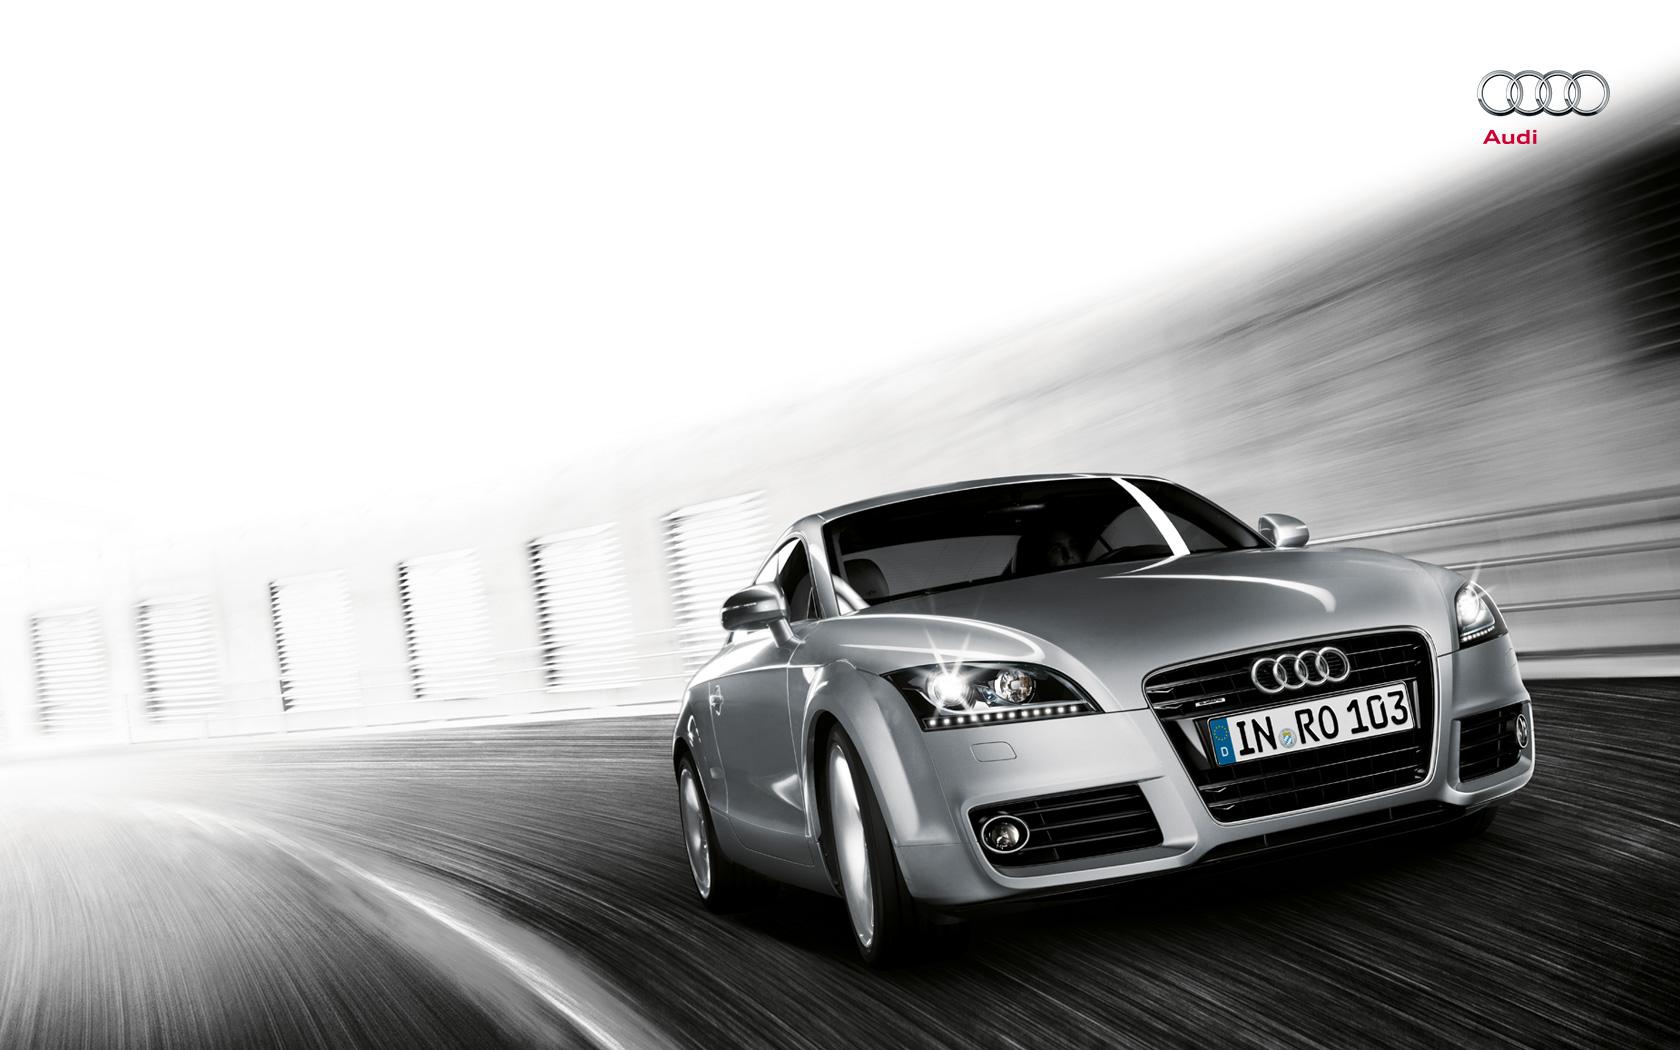 audi wallpaper (Audi TT)